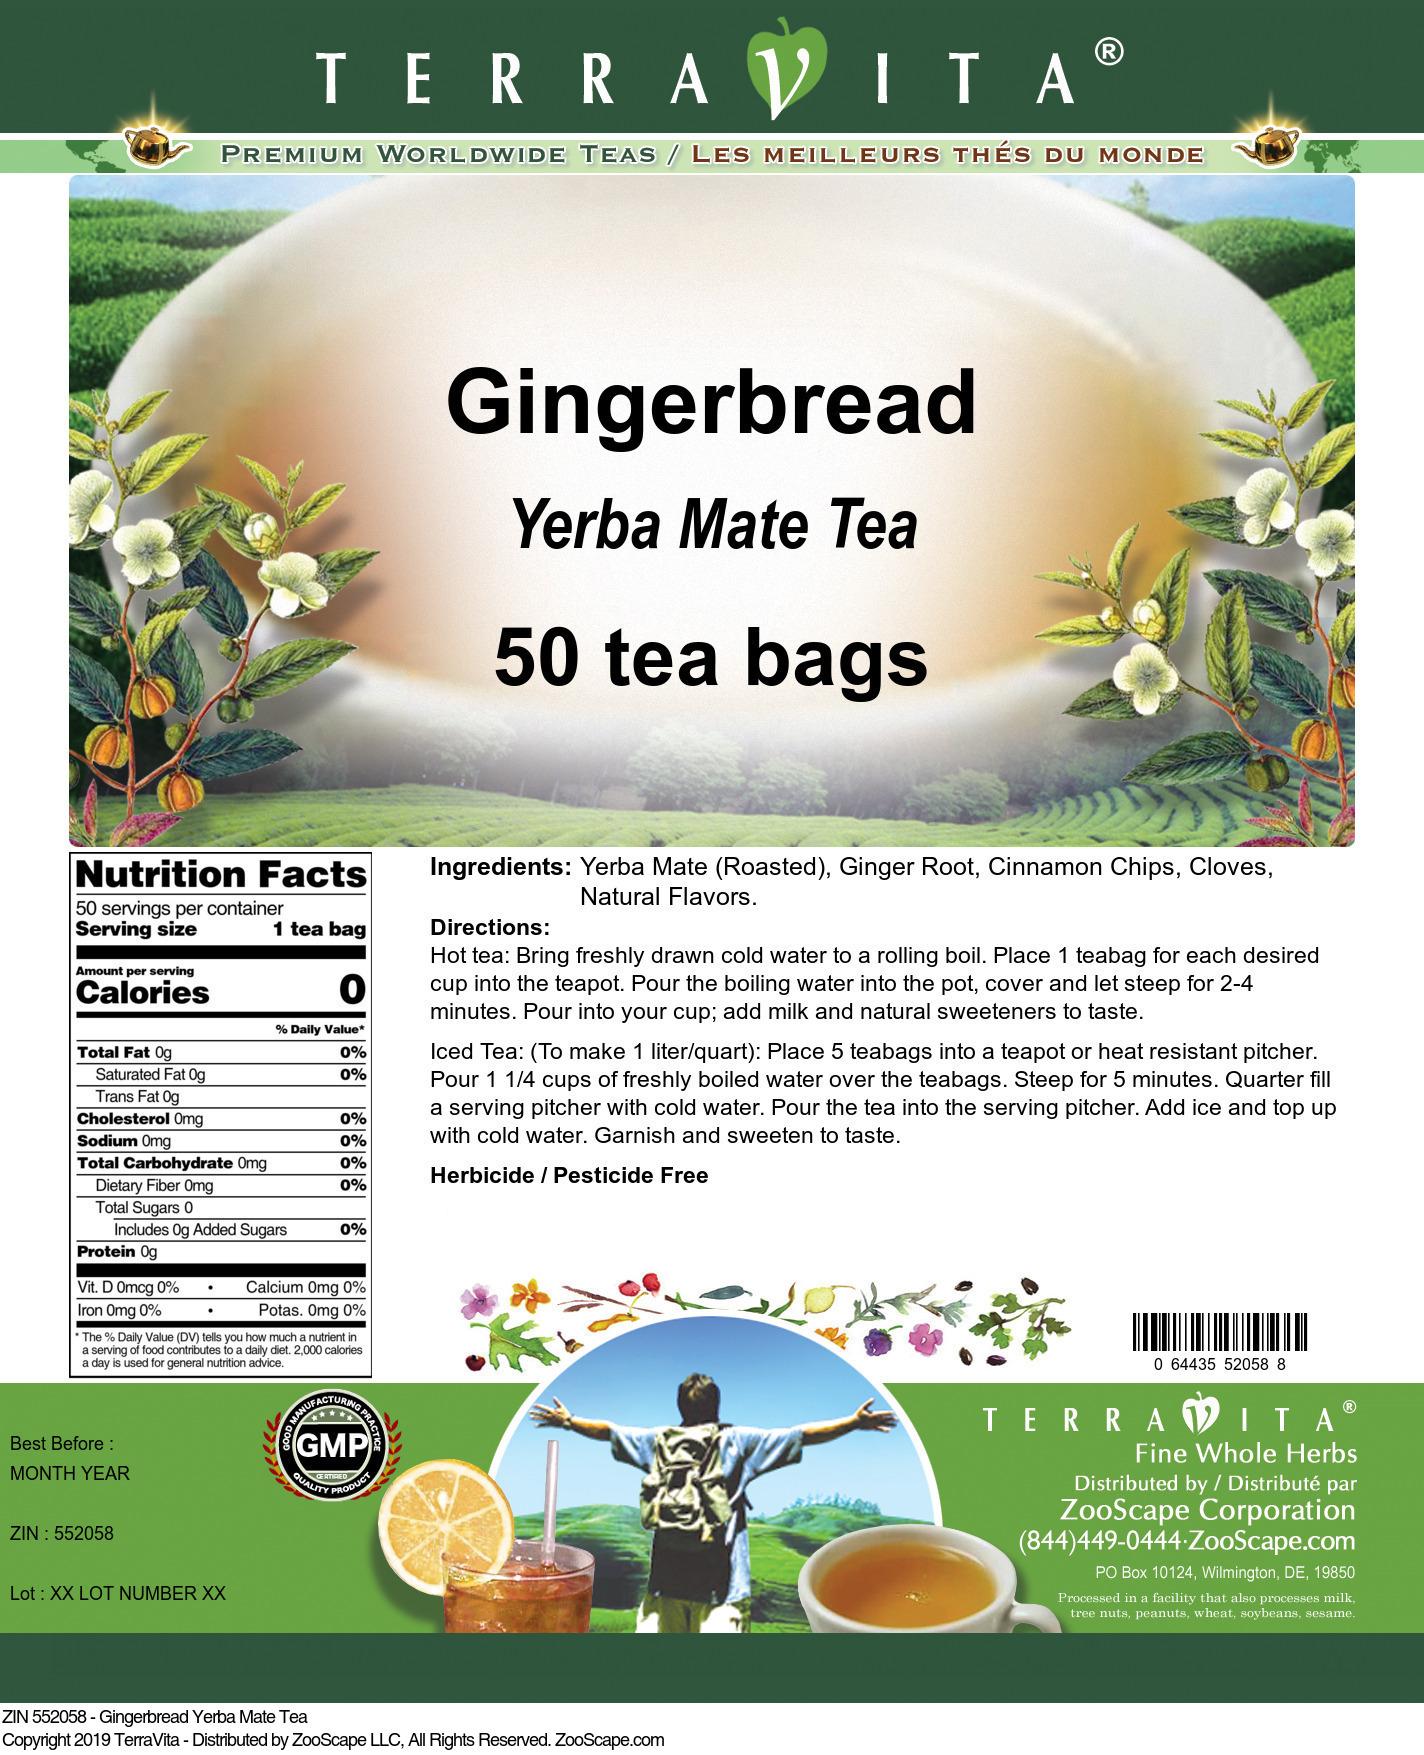 Gingerbread Yerba Mate Tea